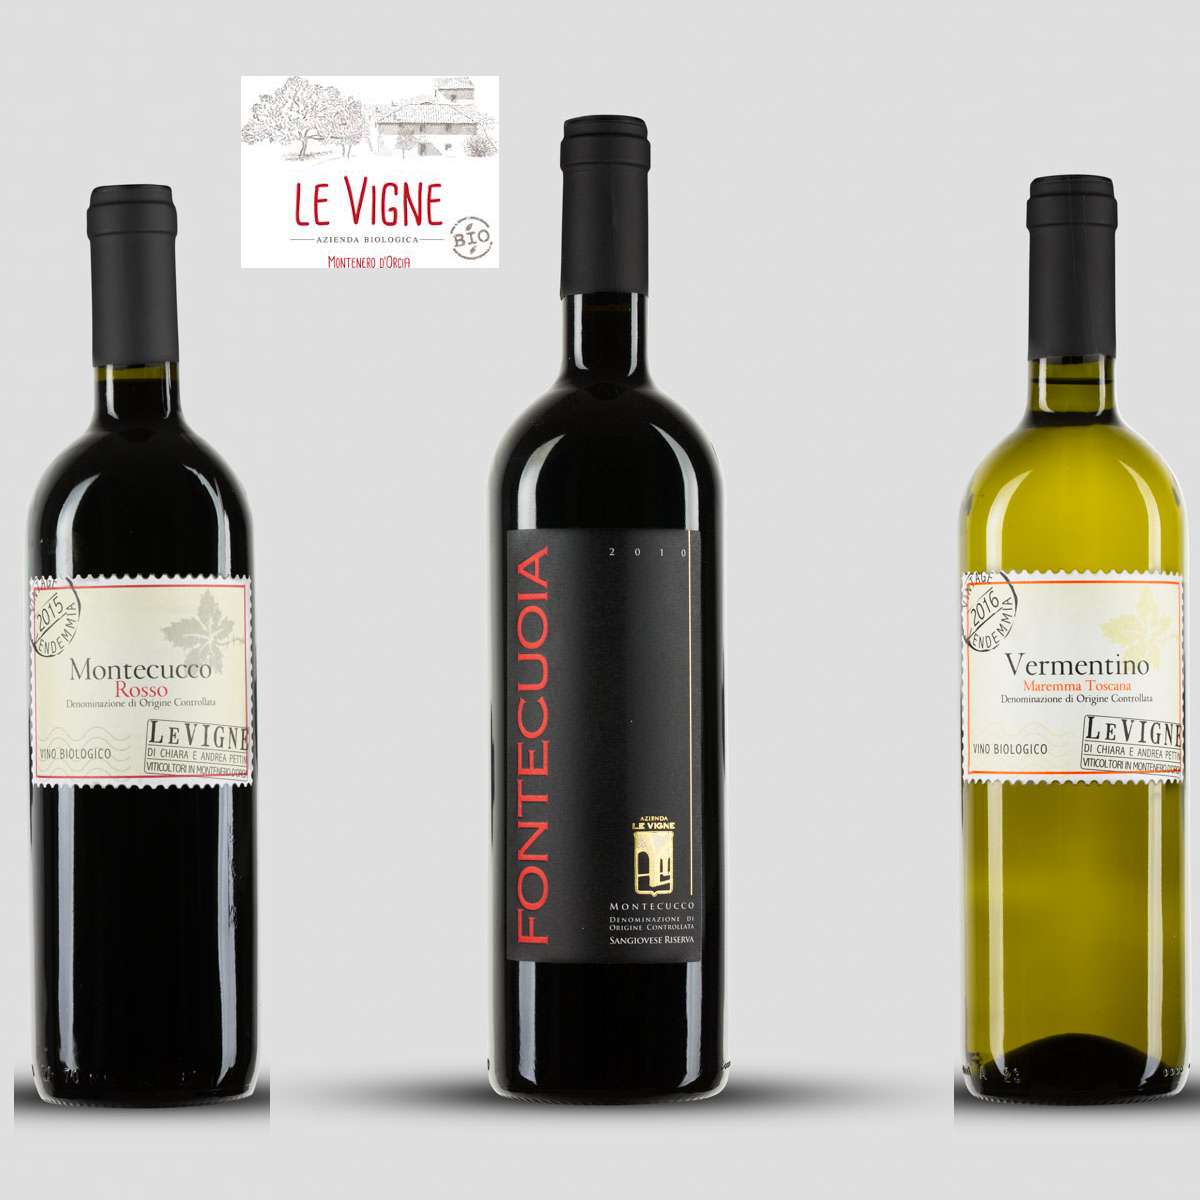 Le_Vigne_vino Montecucco